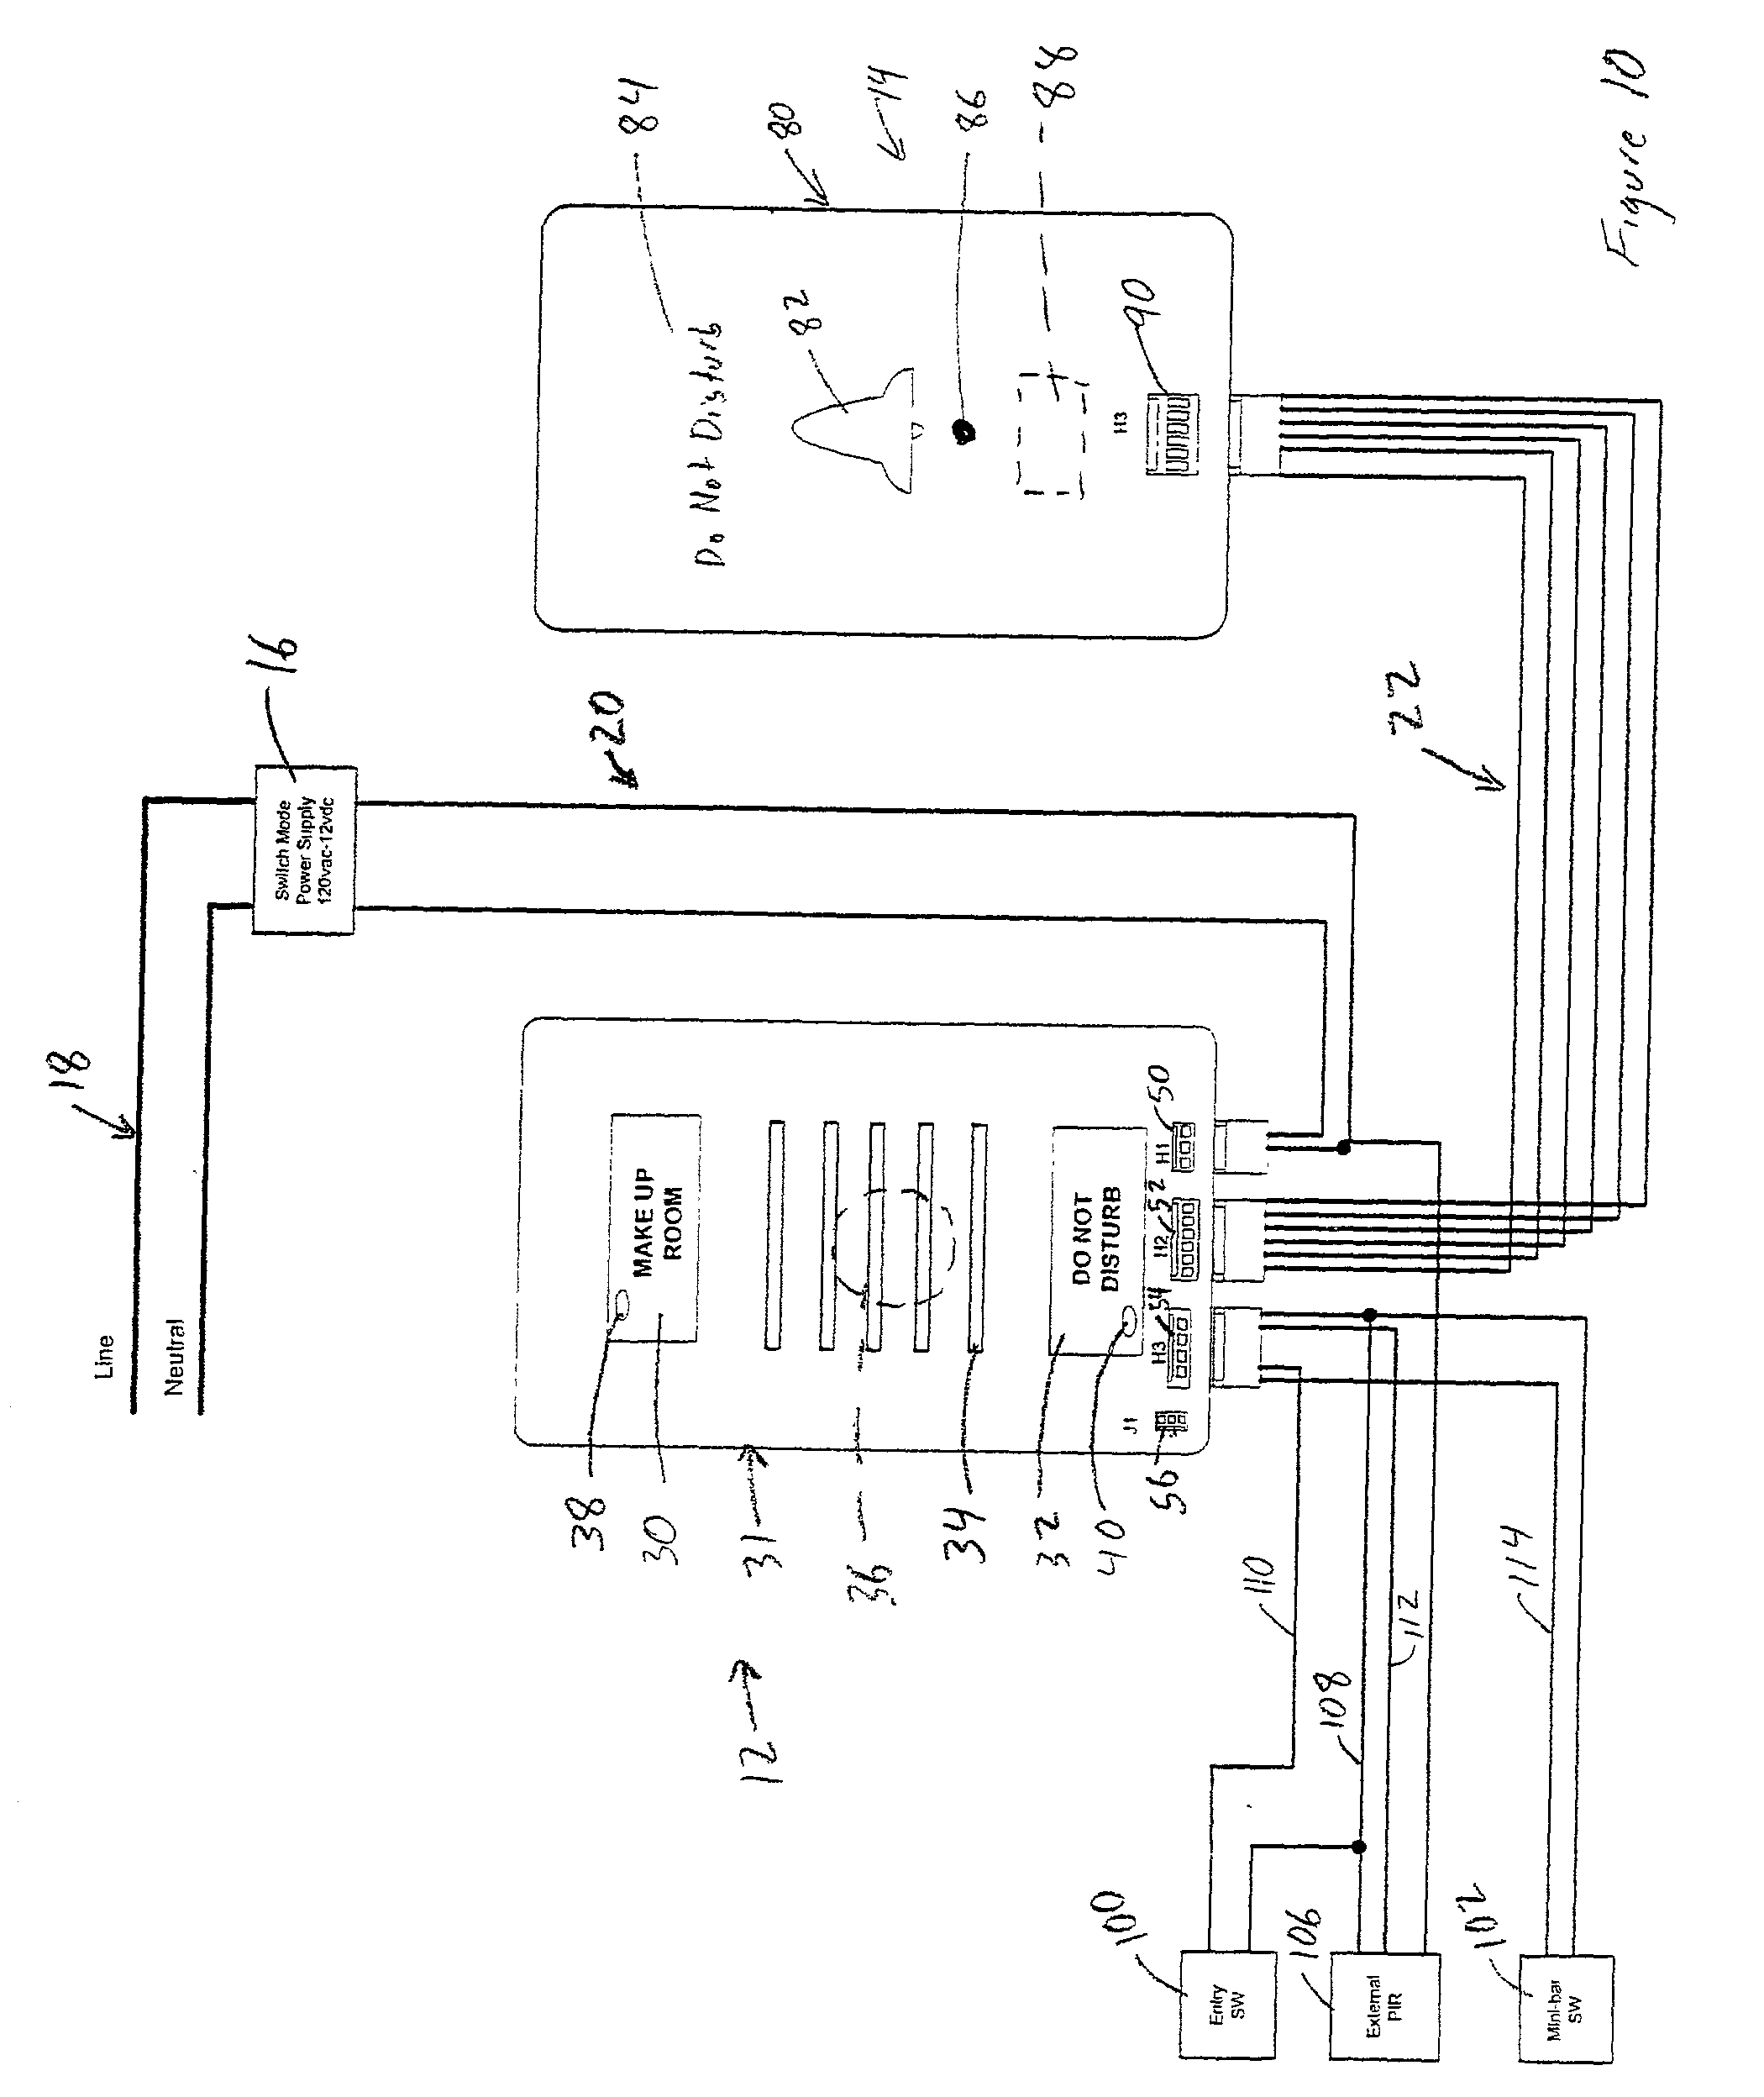 Inncom Thermostat Wiring Diagram - Wiring Diagram •